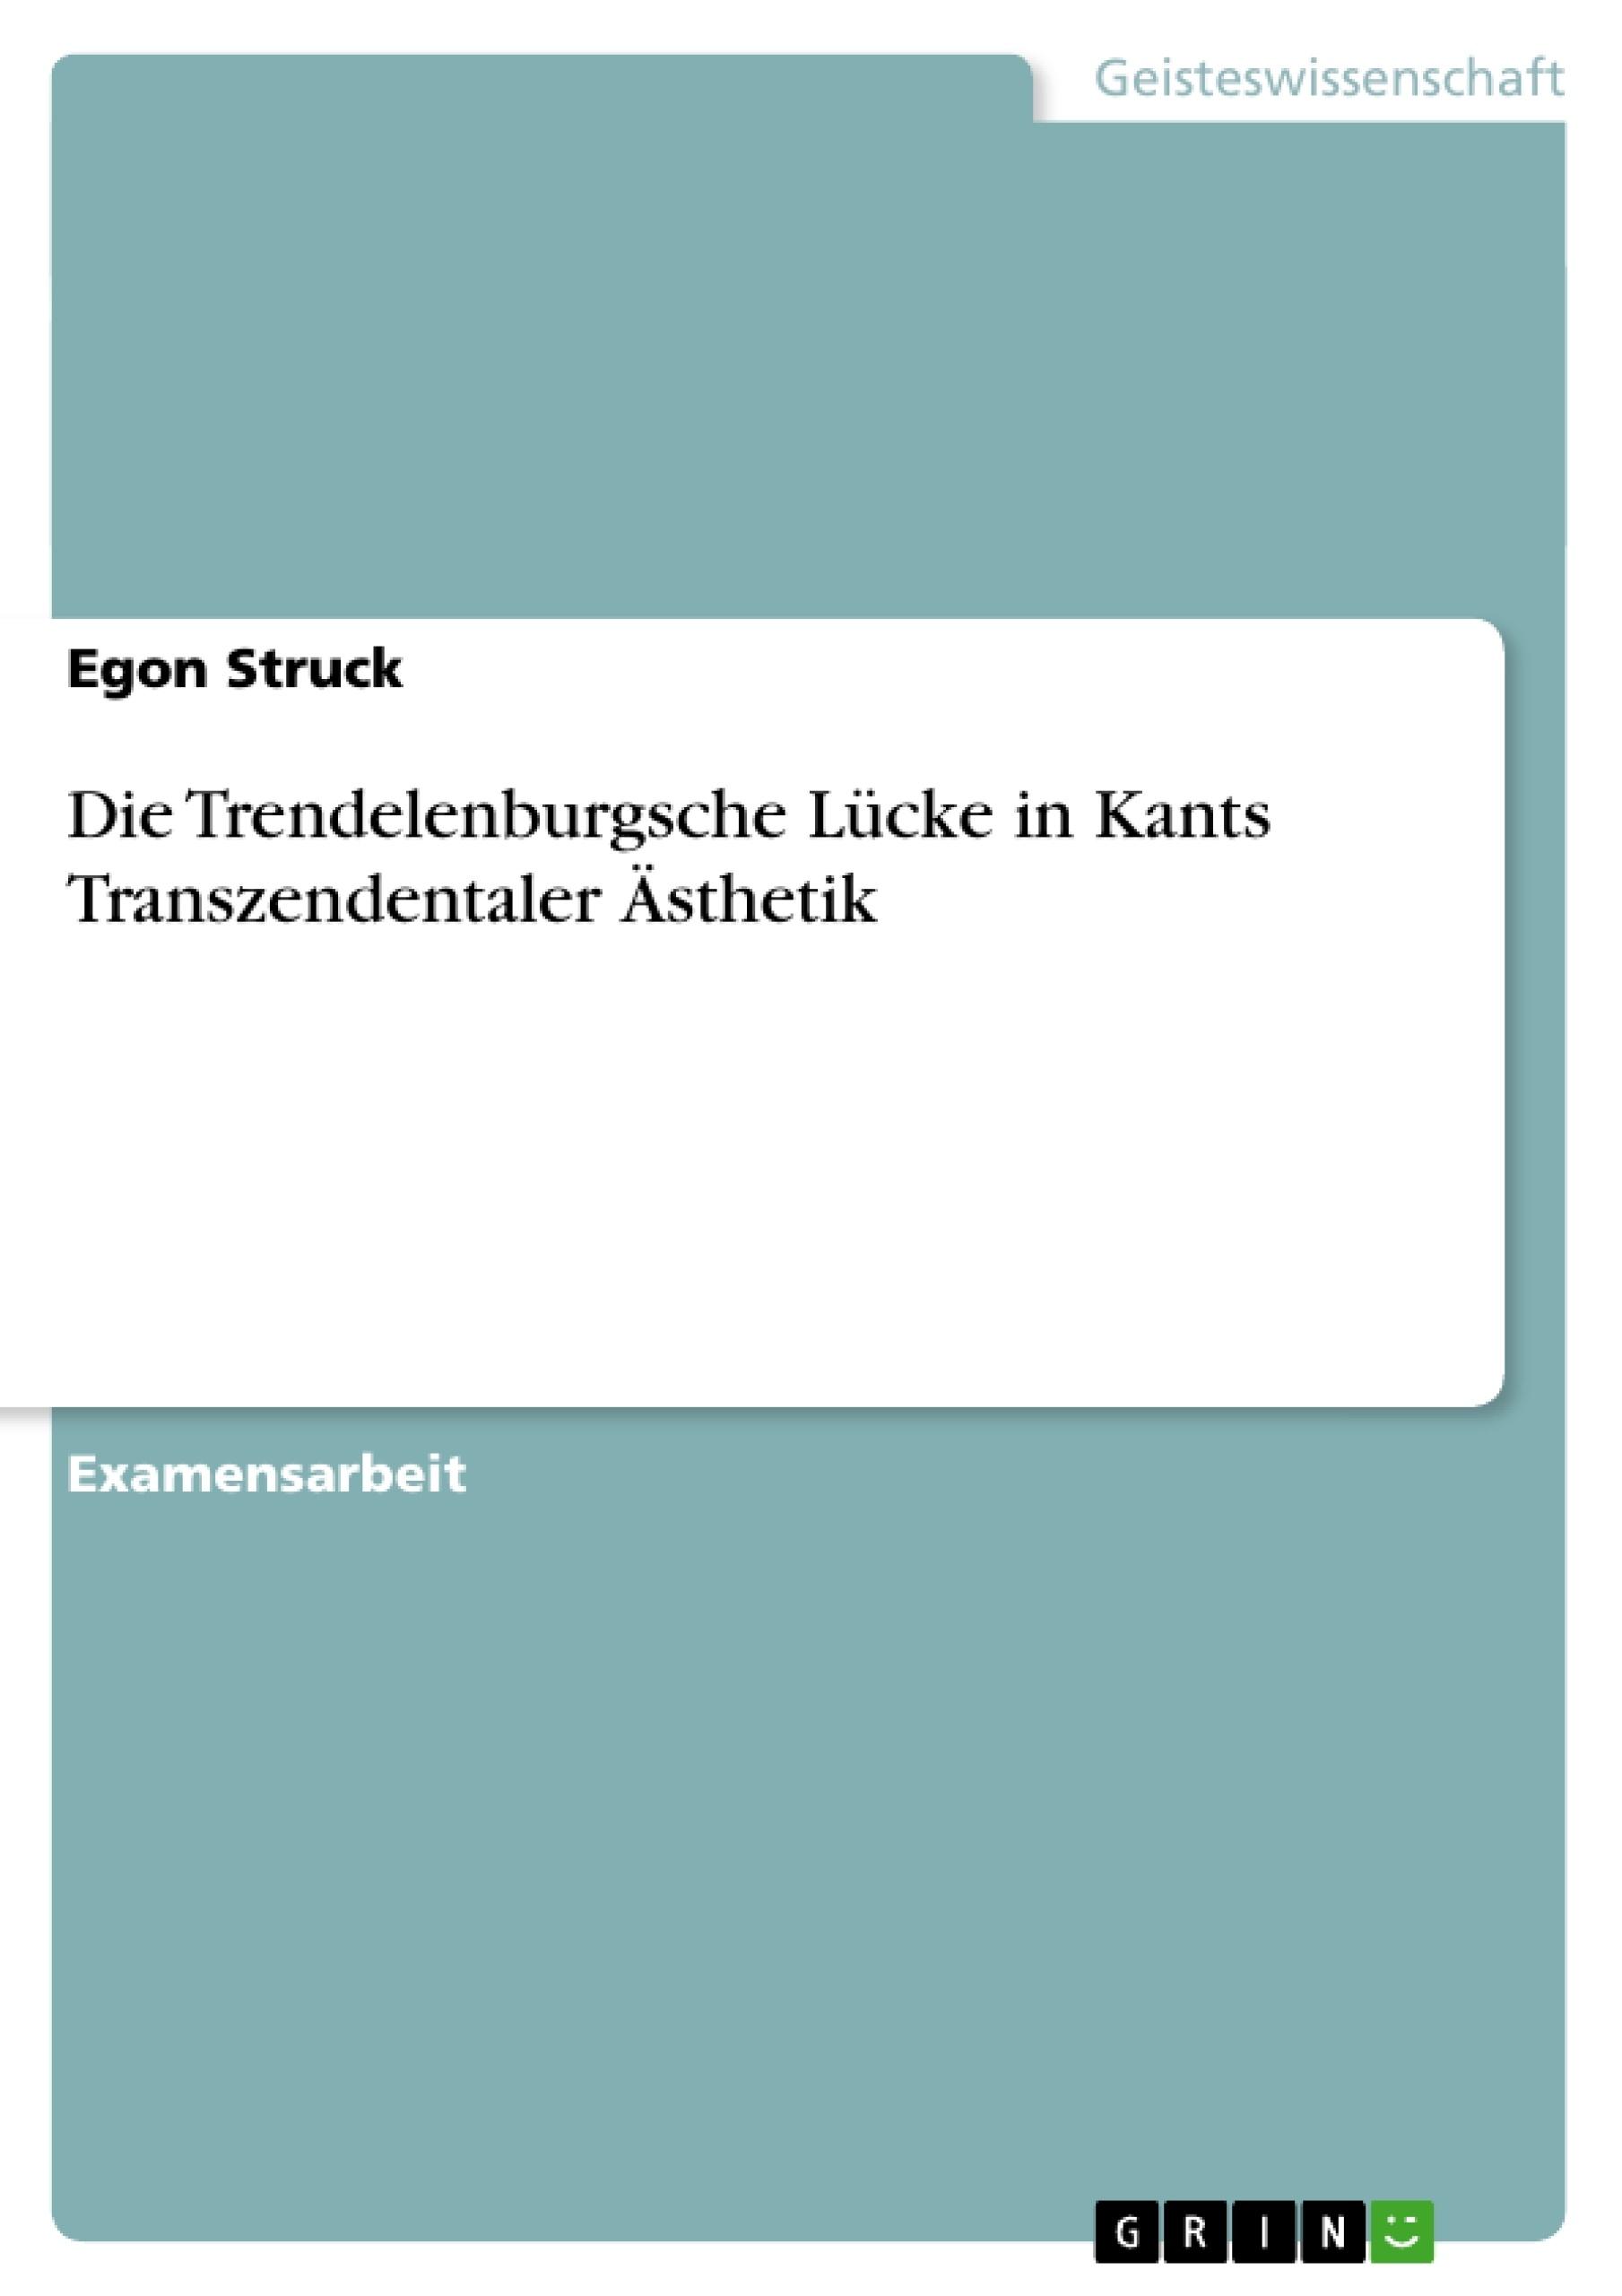 Titel: Die Trendelenburgsche Lücke in Kants Transzendentaler Ästhetik